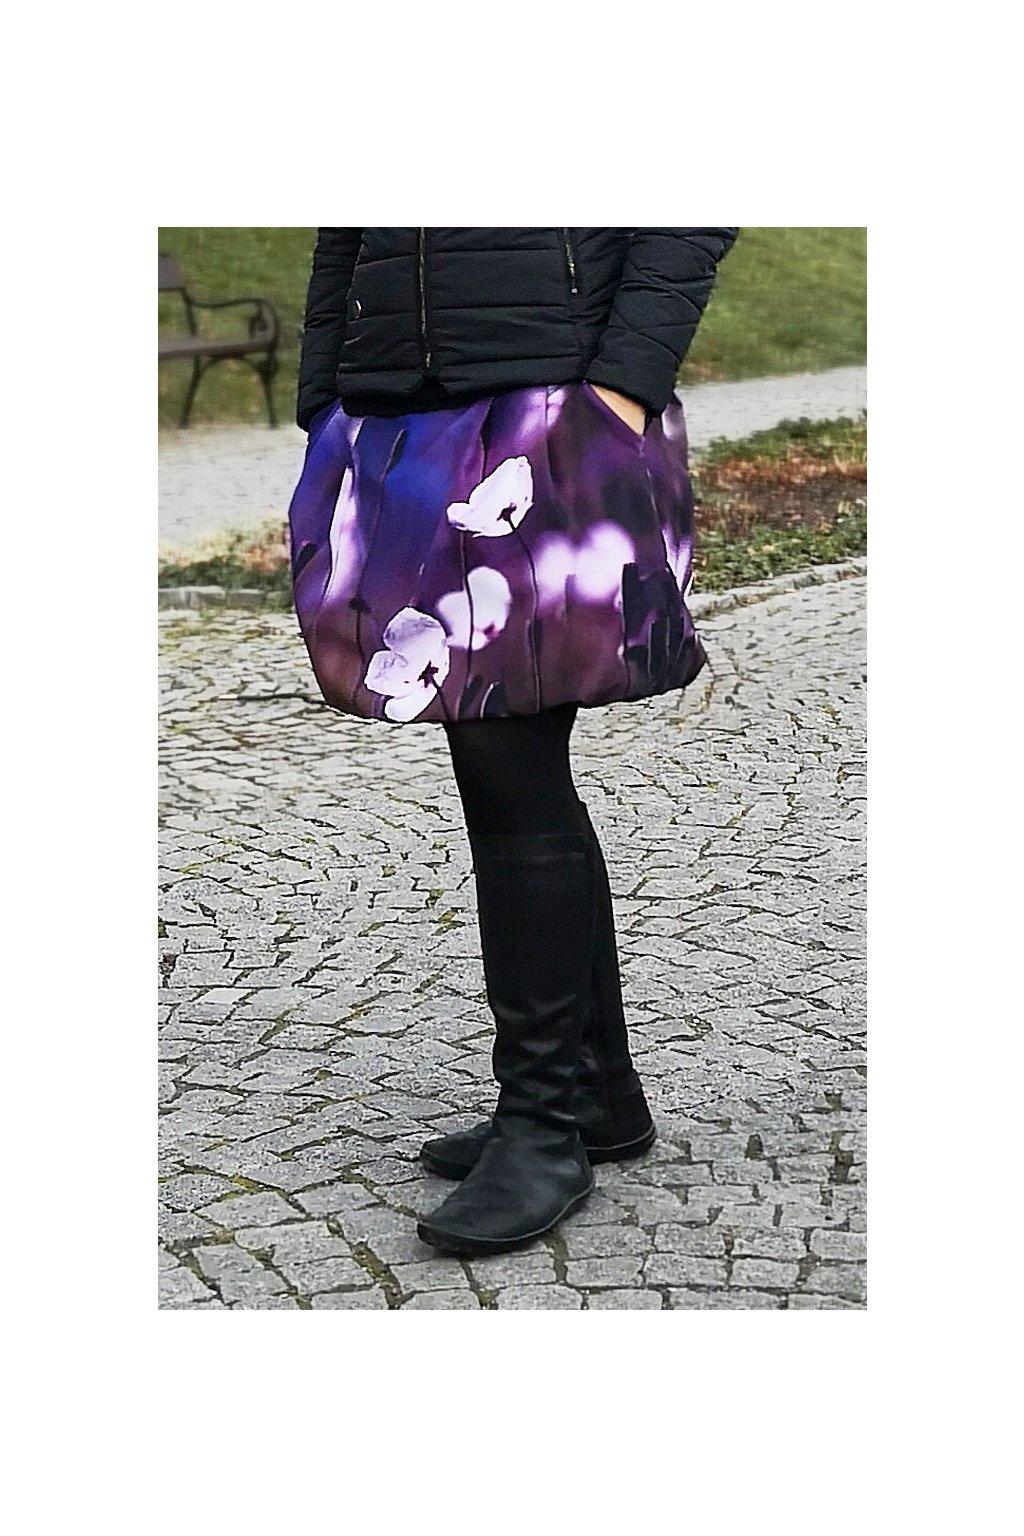 vyrp11 488papilio clothing kvety z cervanku